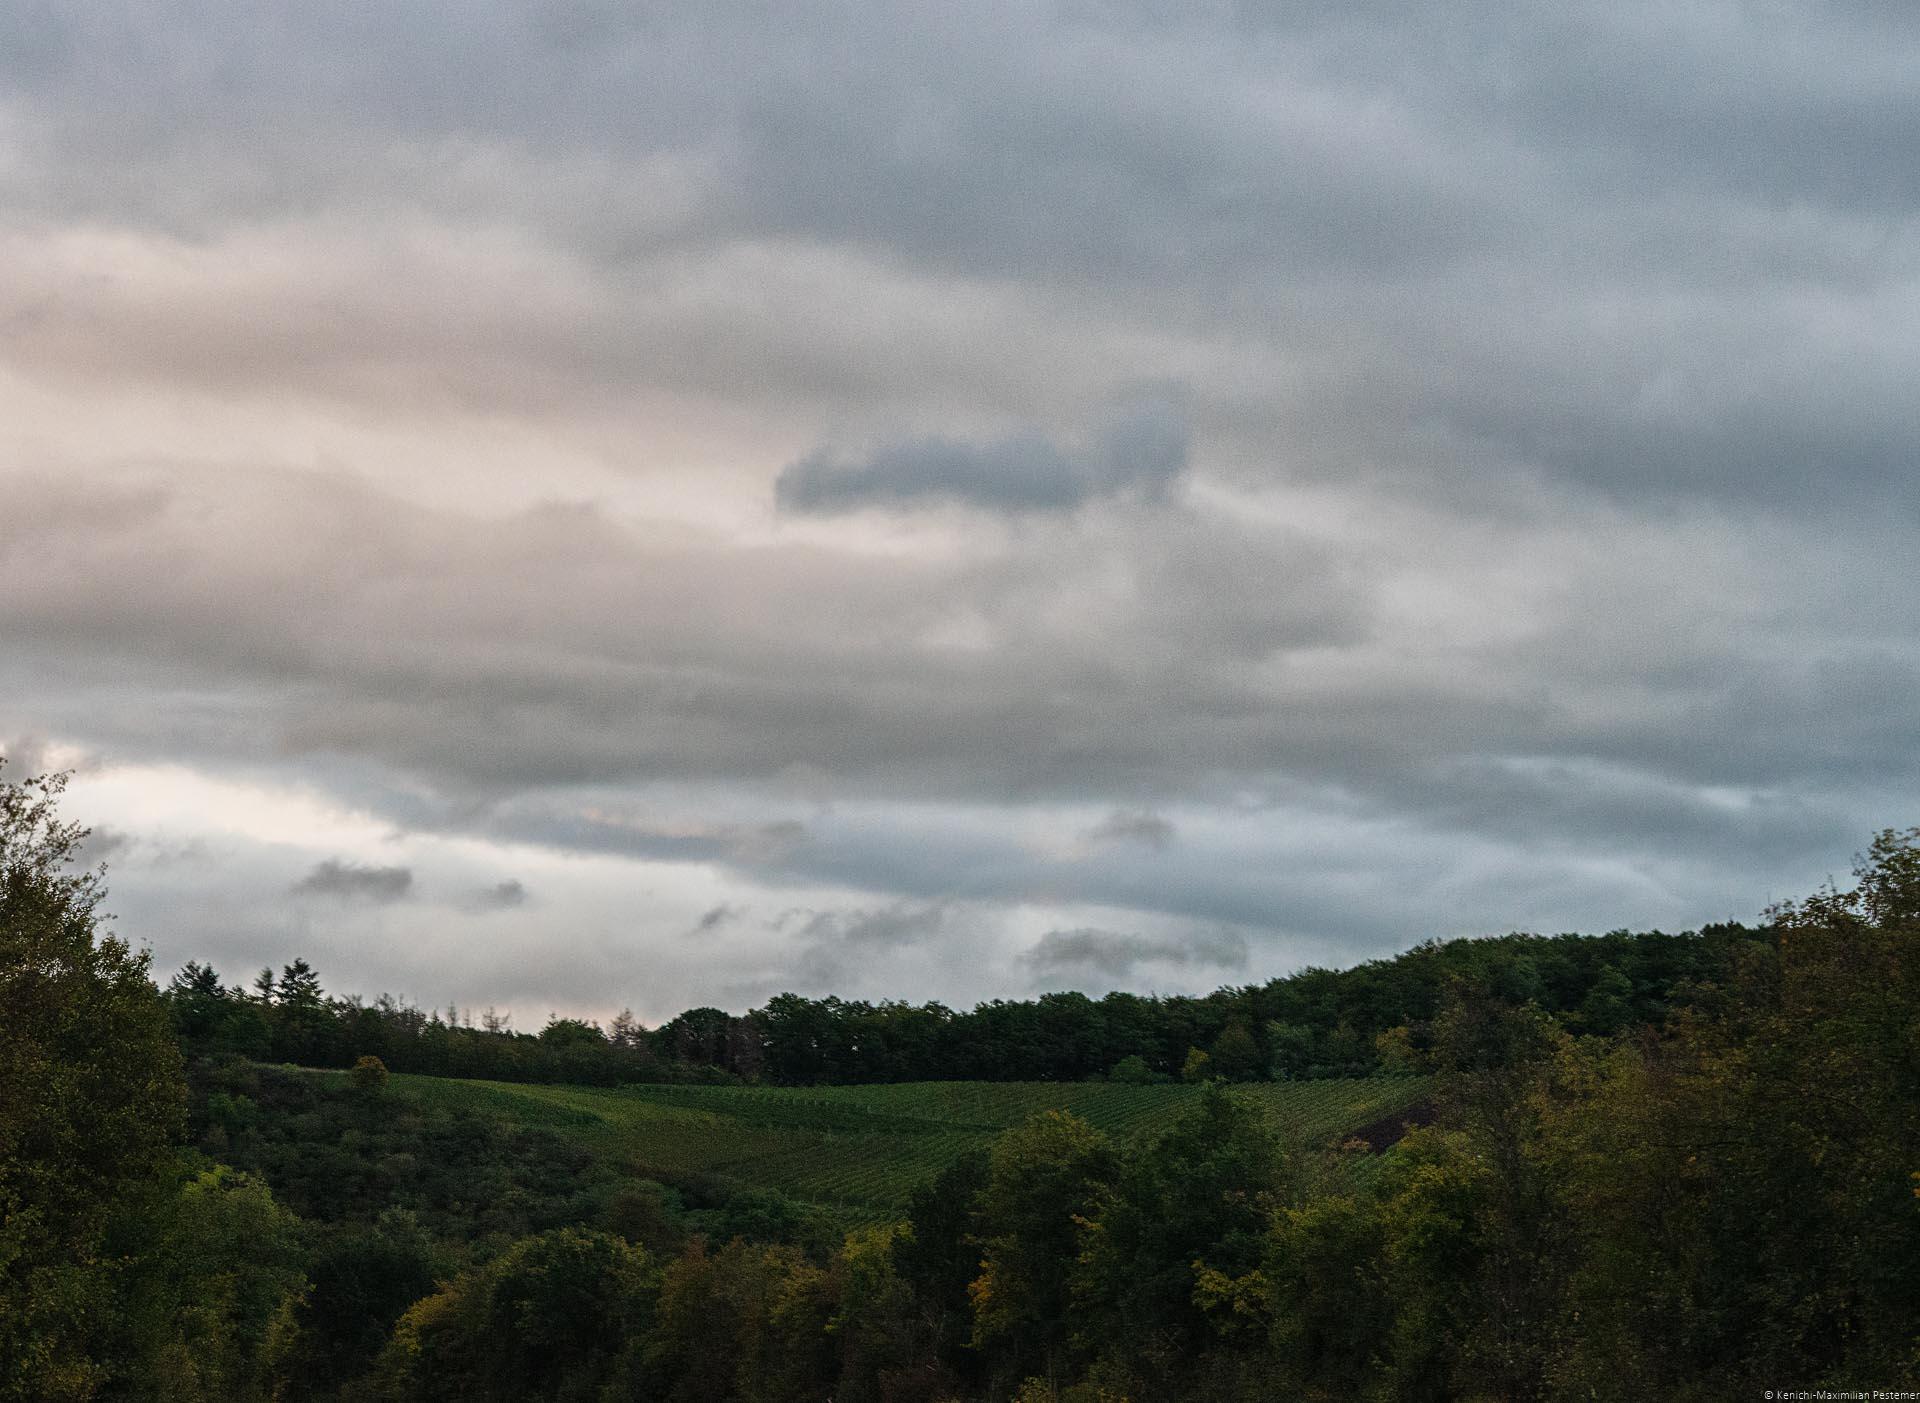 Weinberg Heimersheimer Kapellenberg im steilen Wald beim Sonnenuntergang mit bewölktem Himmel am späten Abend